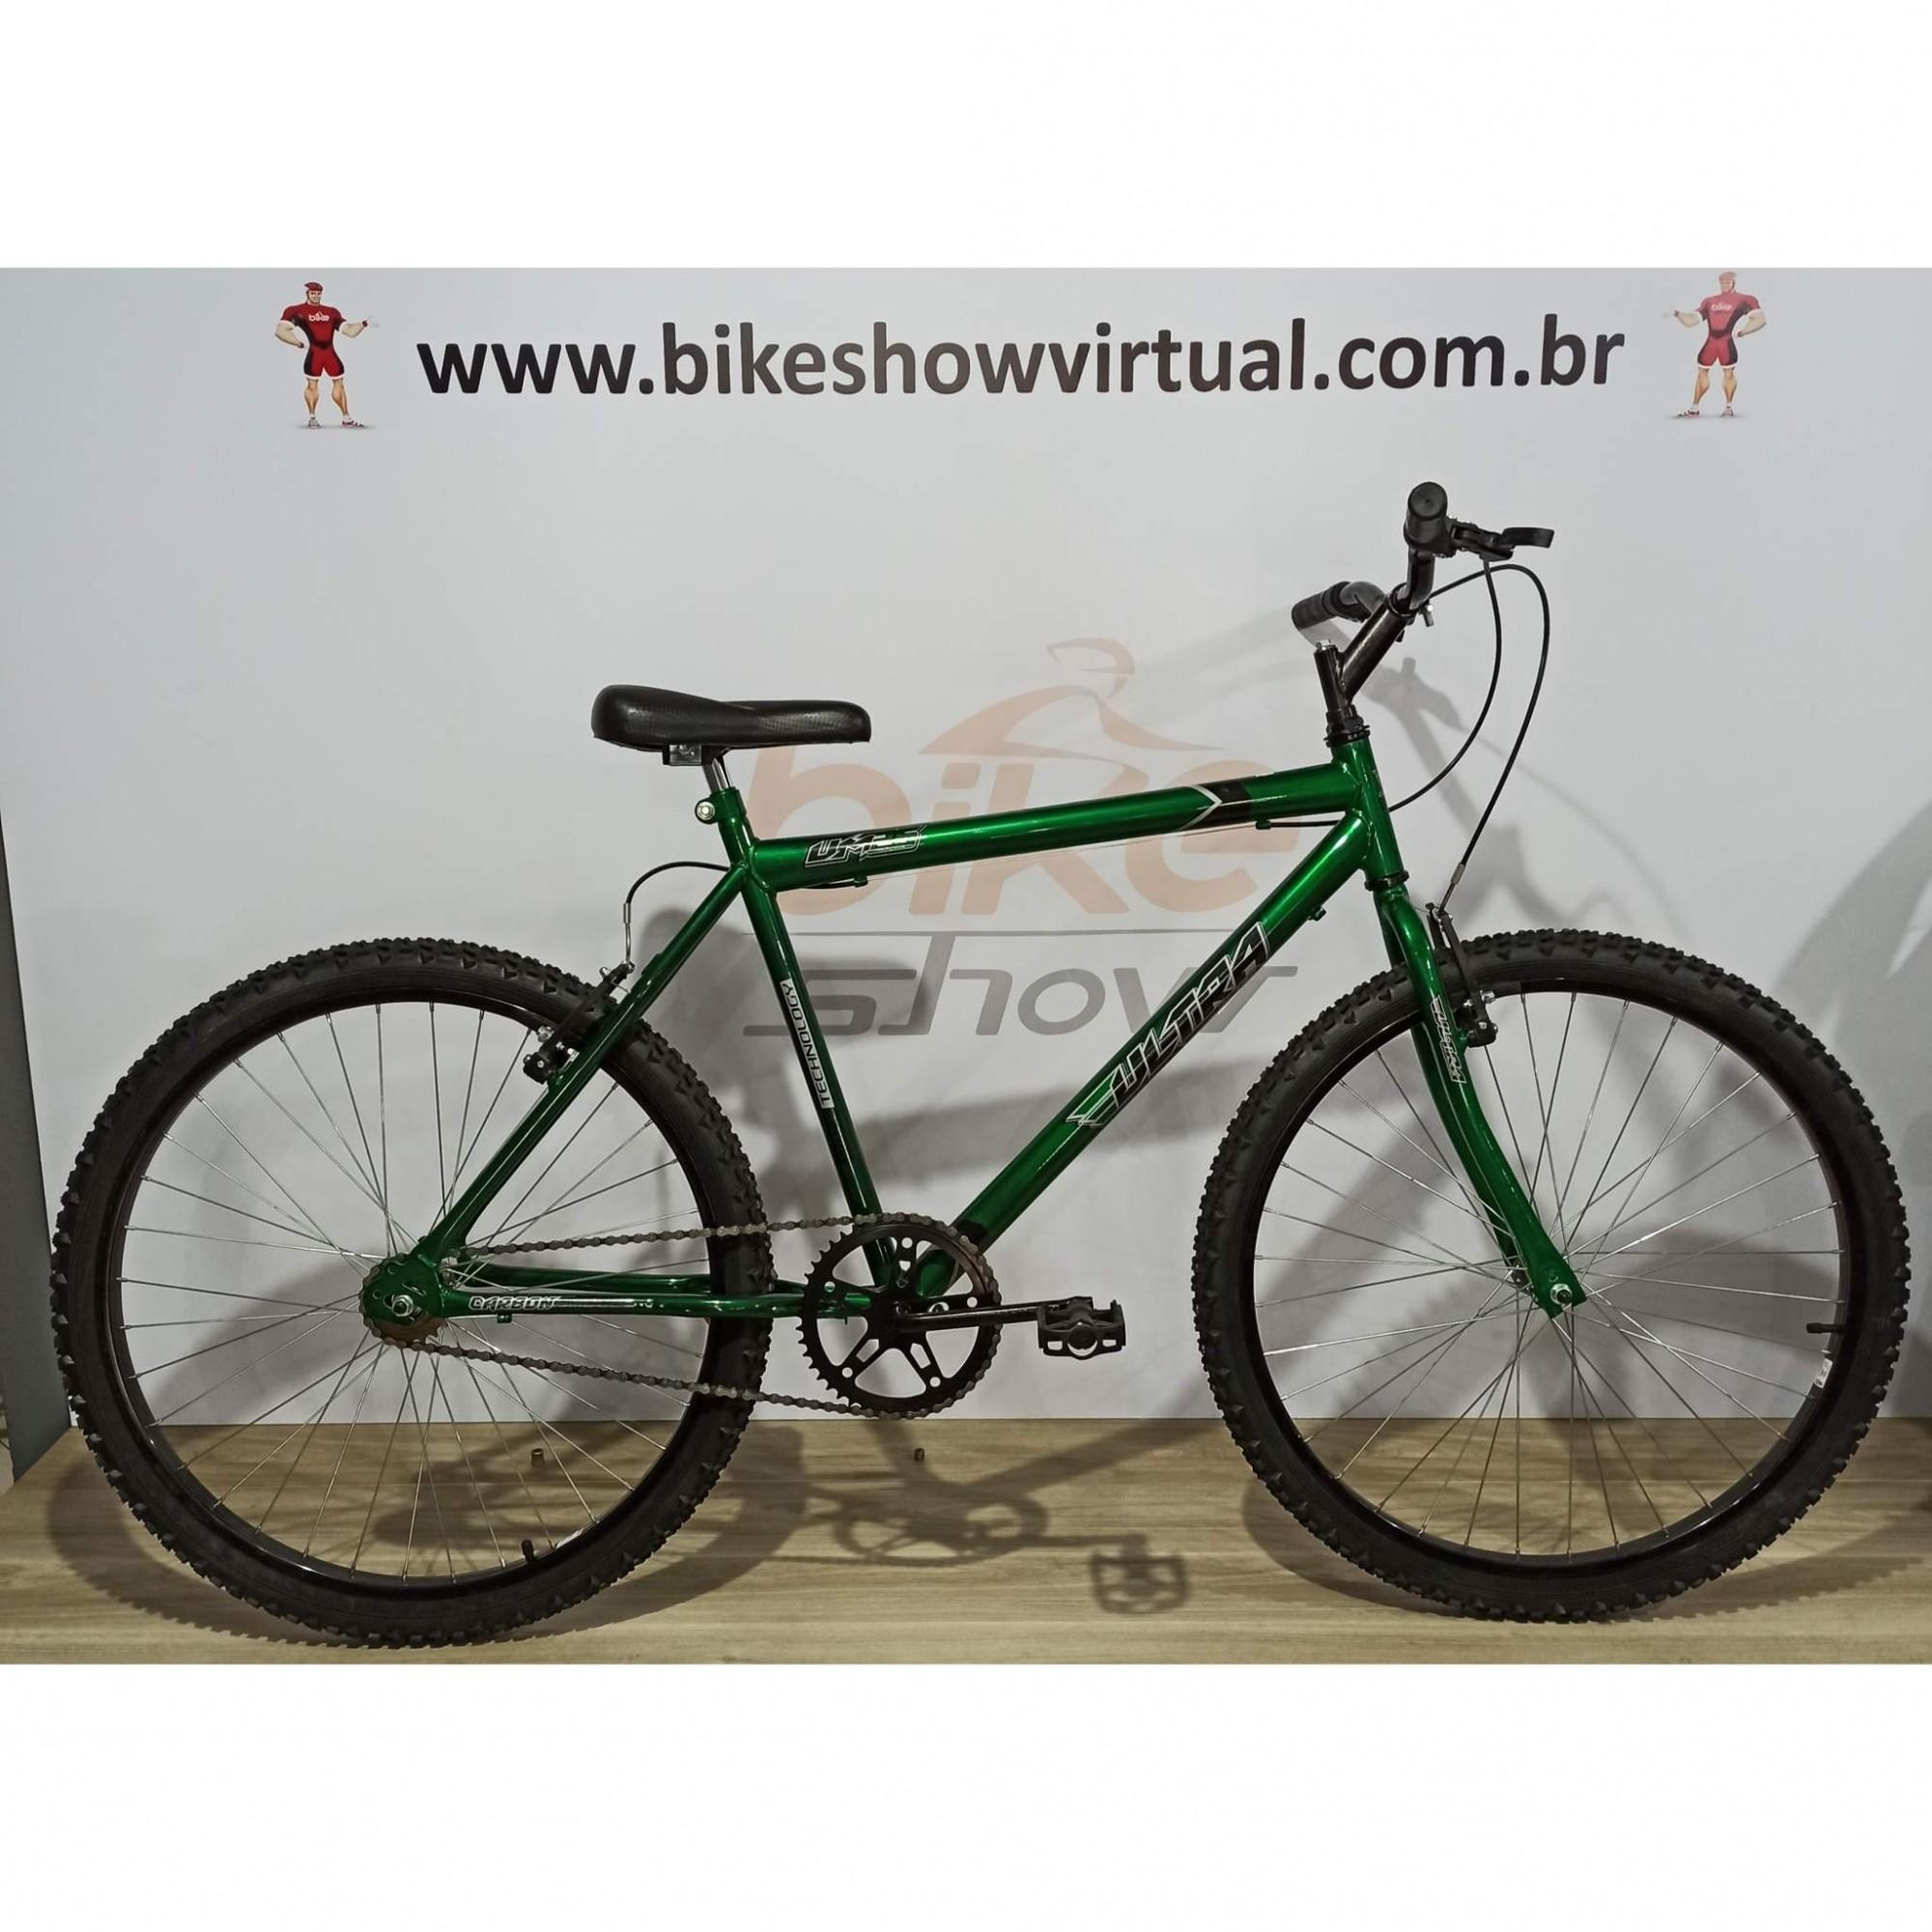 Bicicleta ULTRA BIKES aro 26 - Sem Marcha